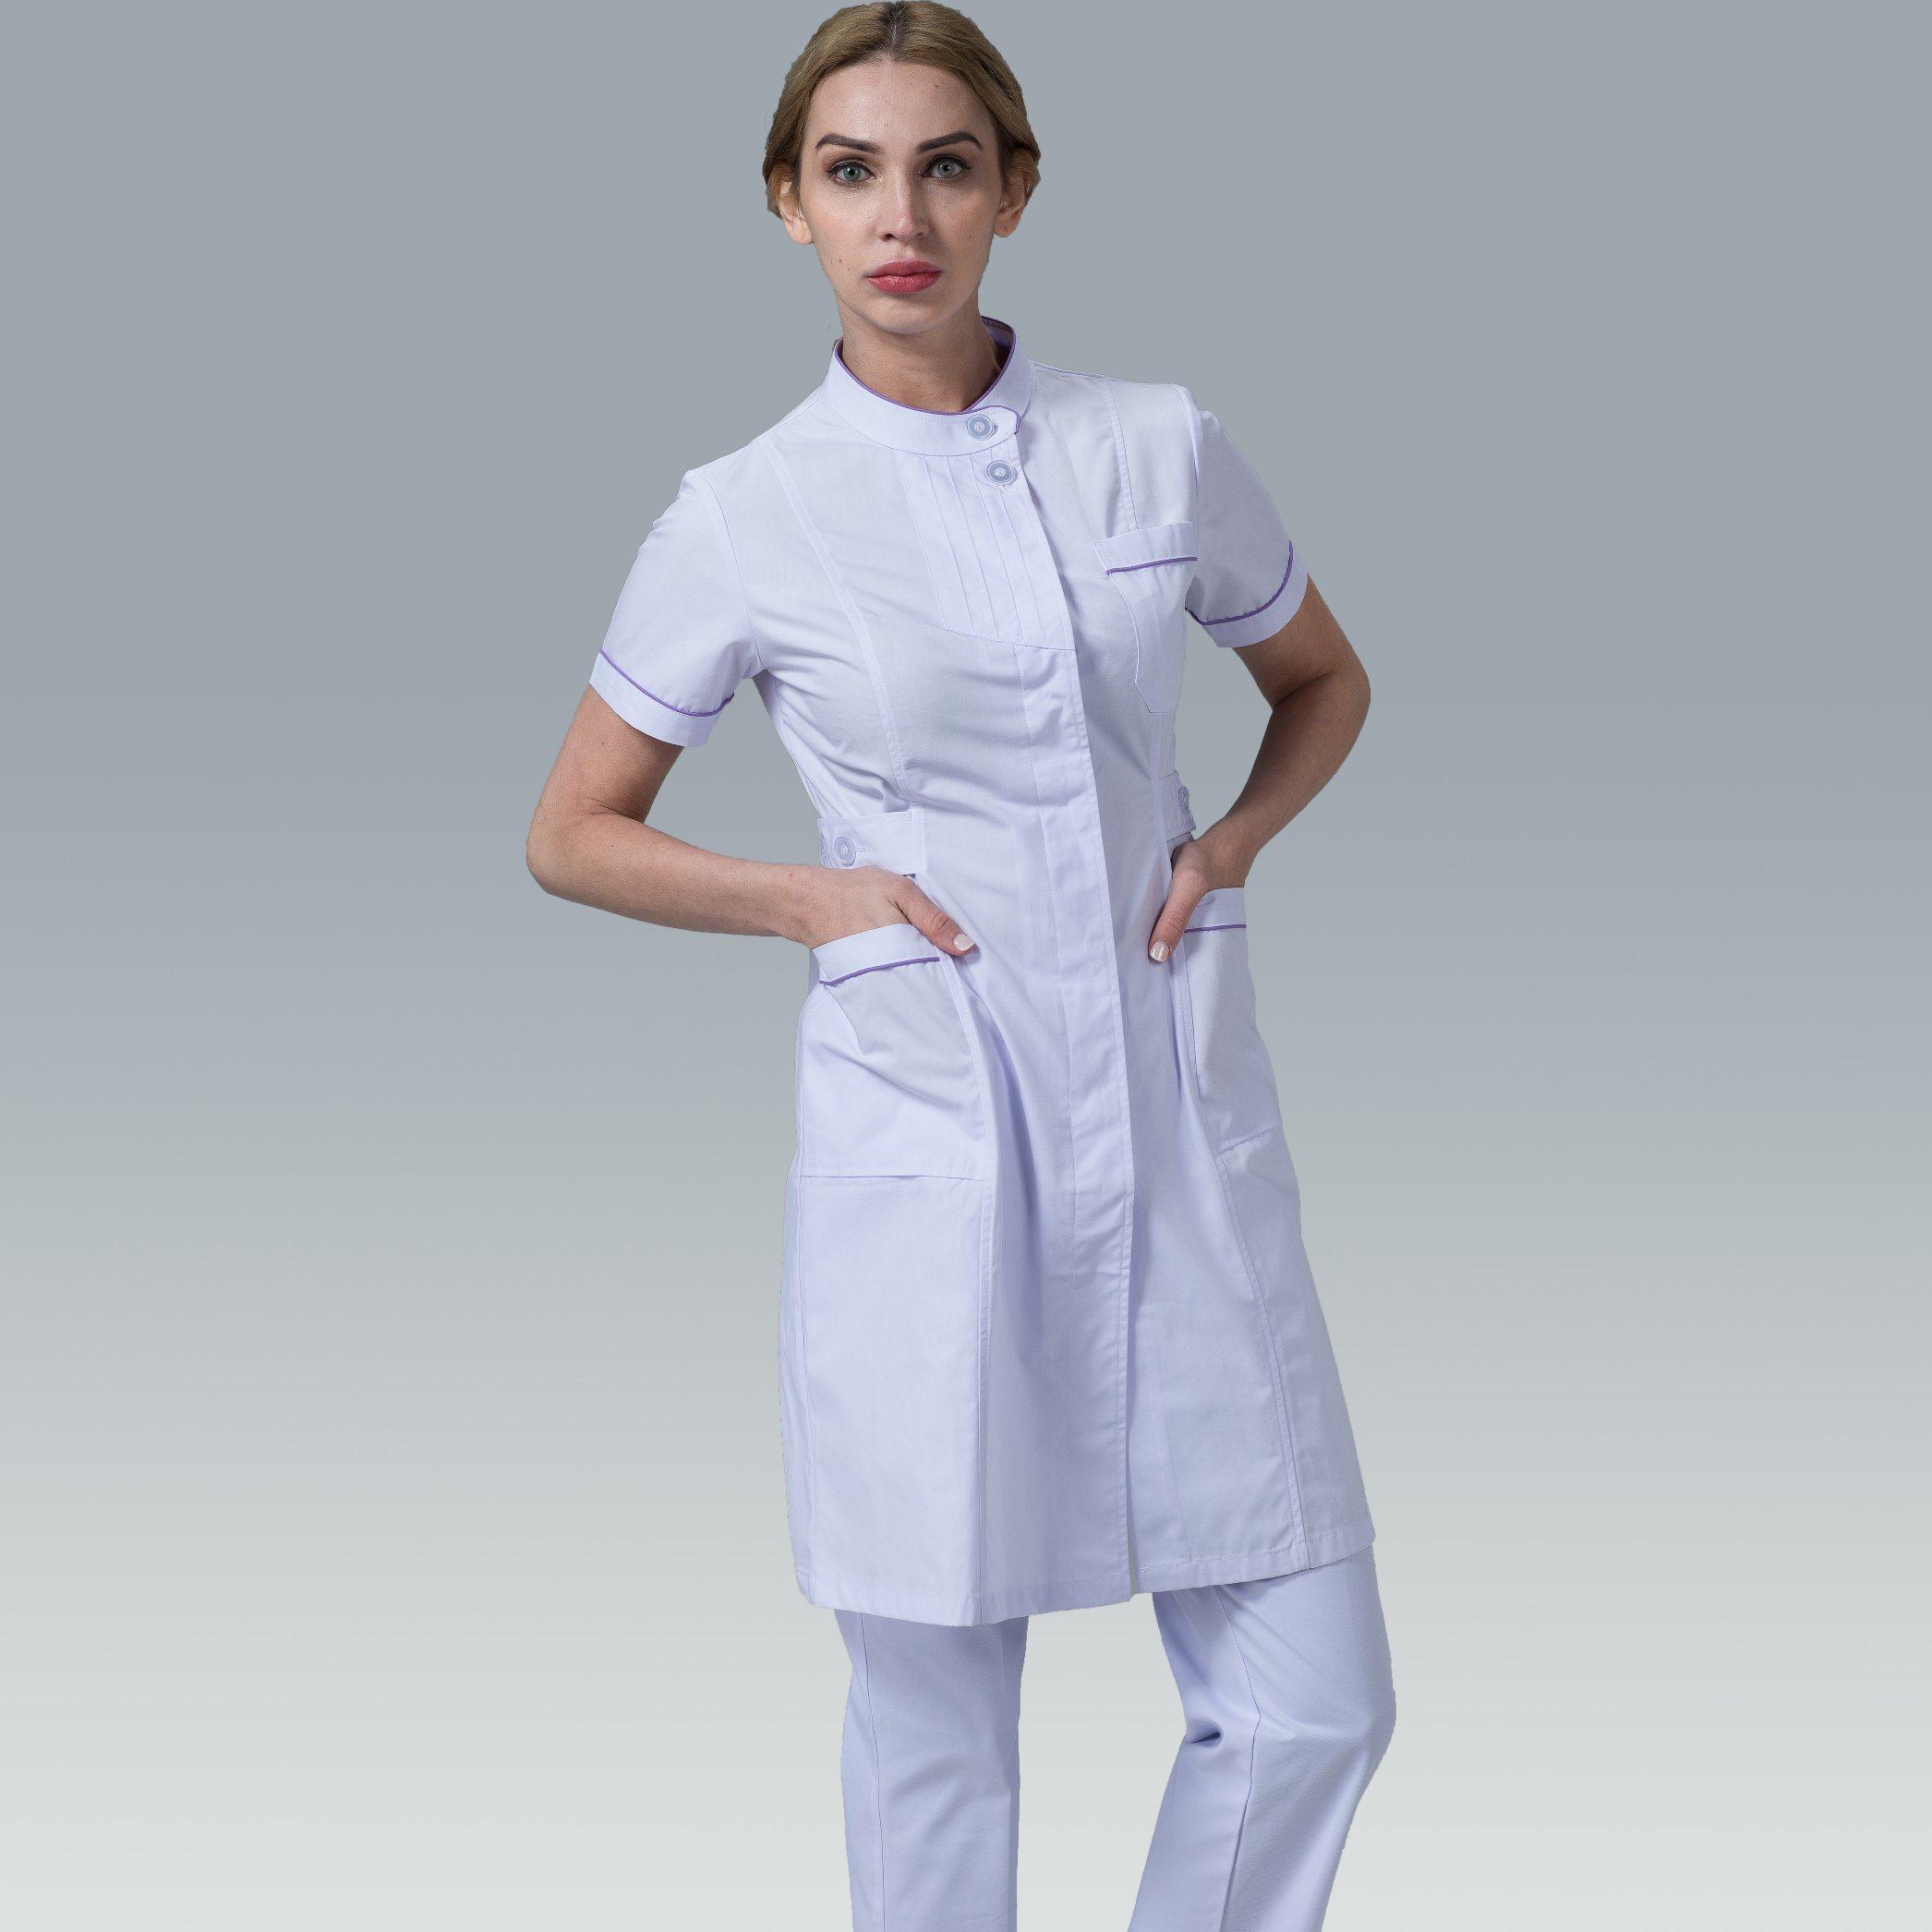 d8f51c426fed2 Made in China Konvier Brand New Style Nurse Uniform Designs Nurse Scrub  Suits - China New Style Nurse Uniform Designs, Nurse Scrub Suits